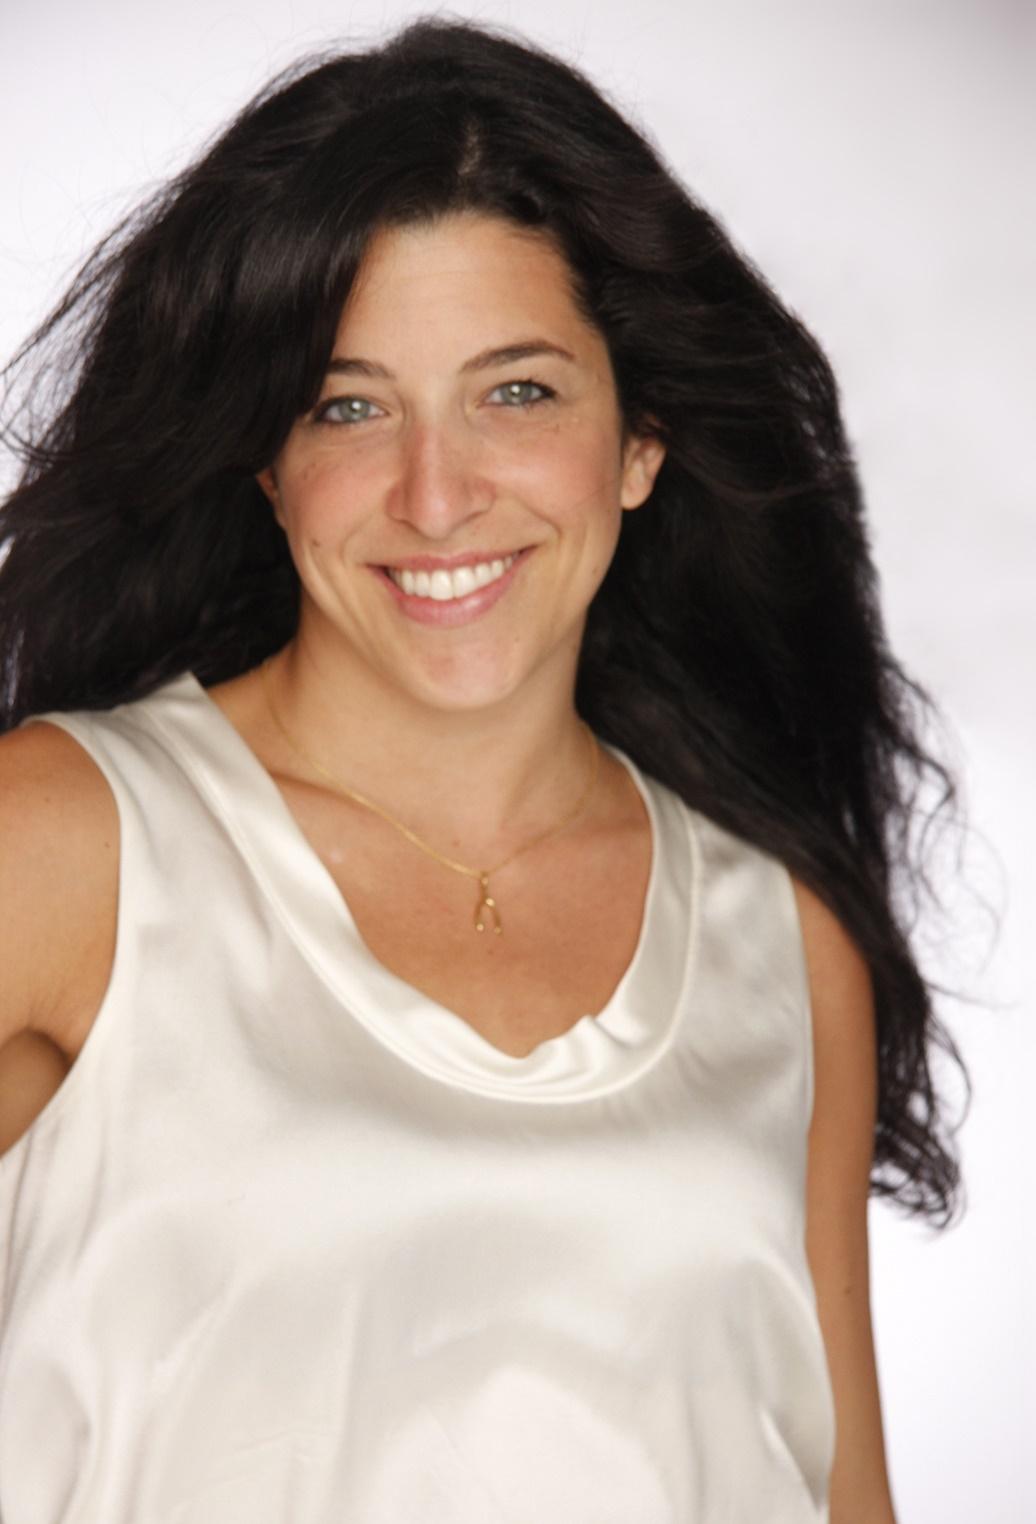 Jessica Houssian